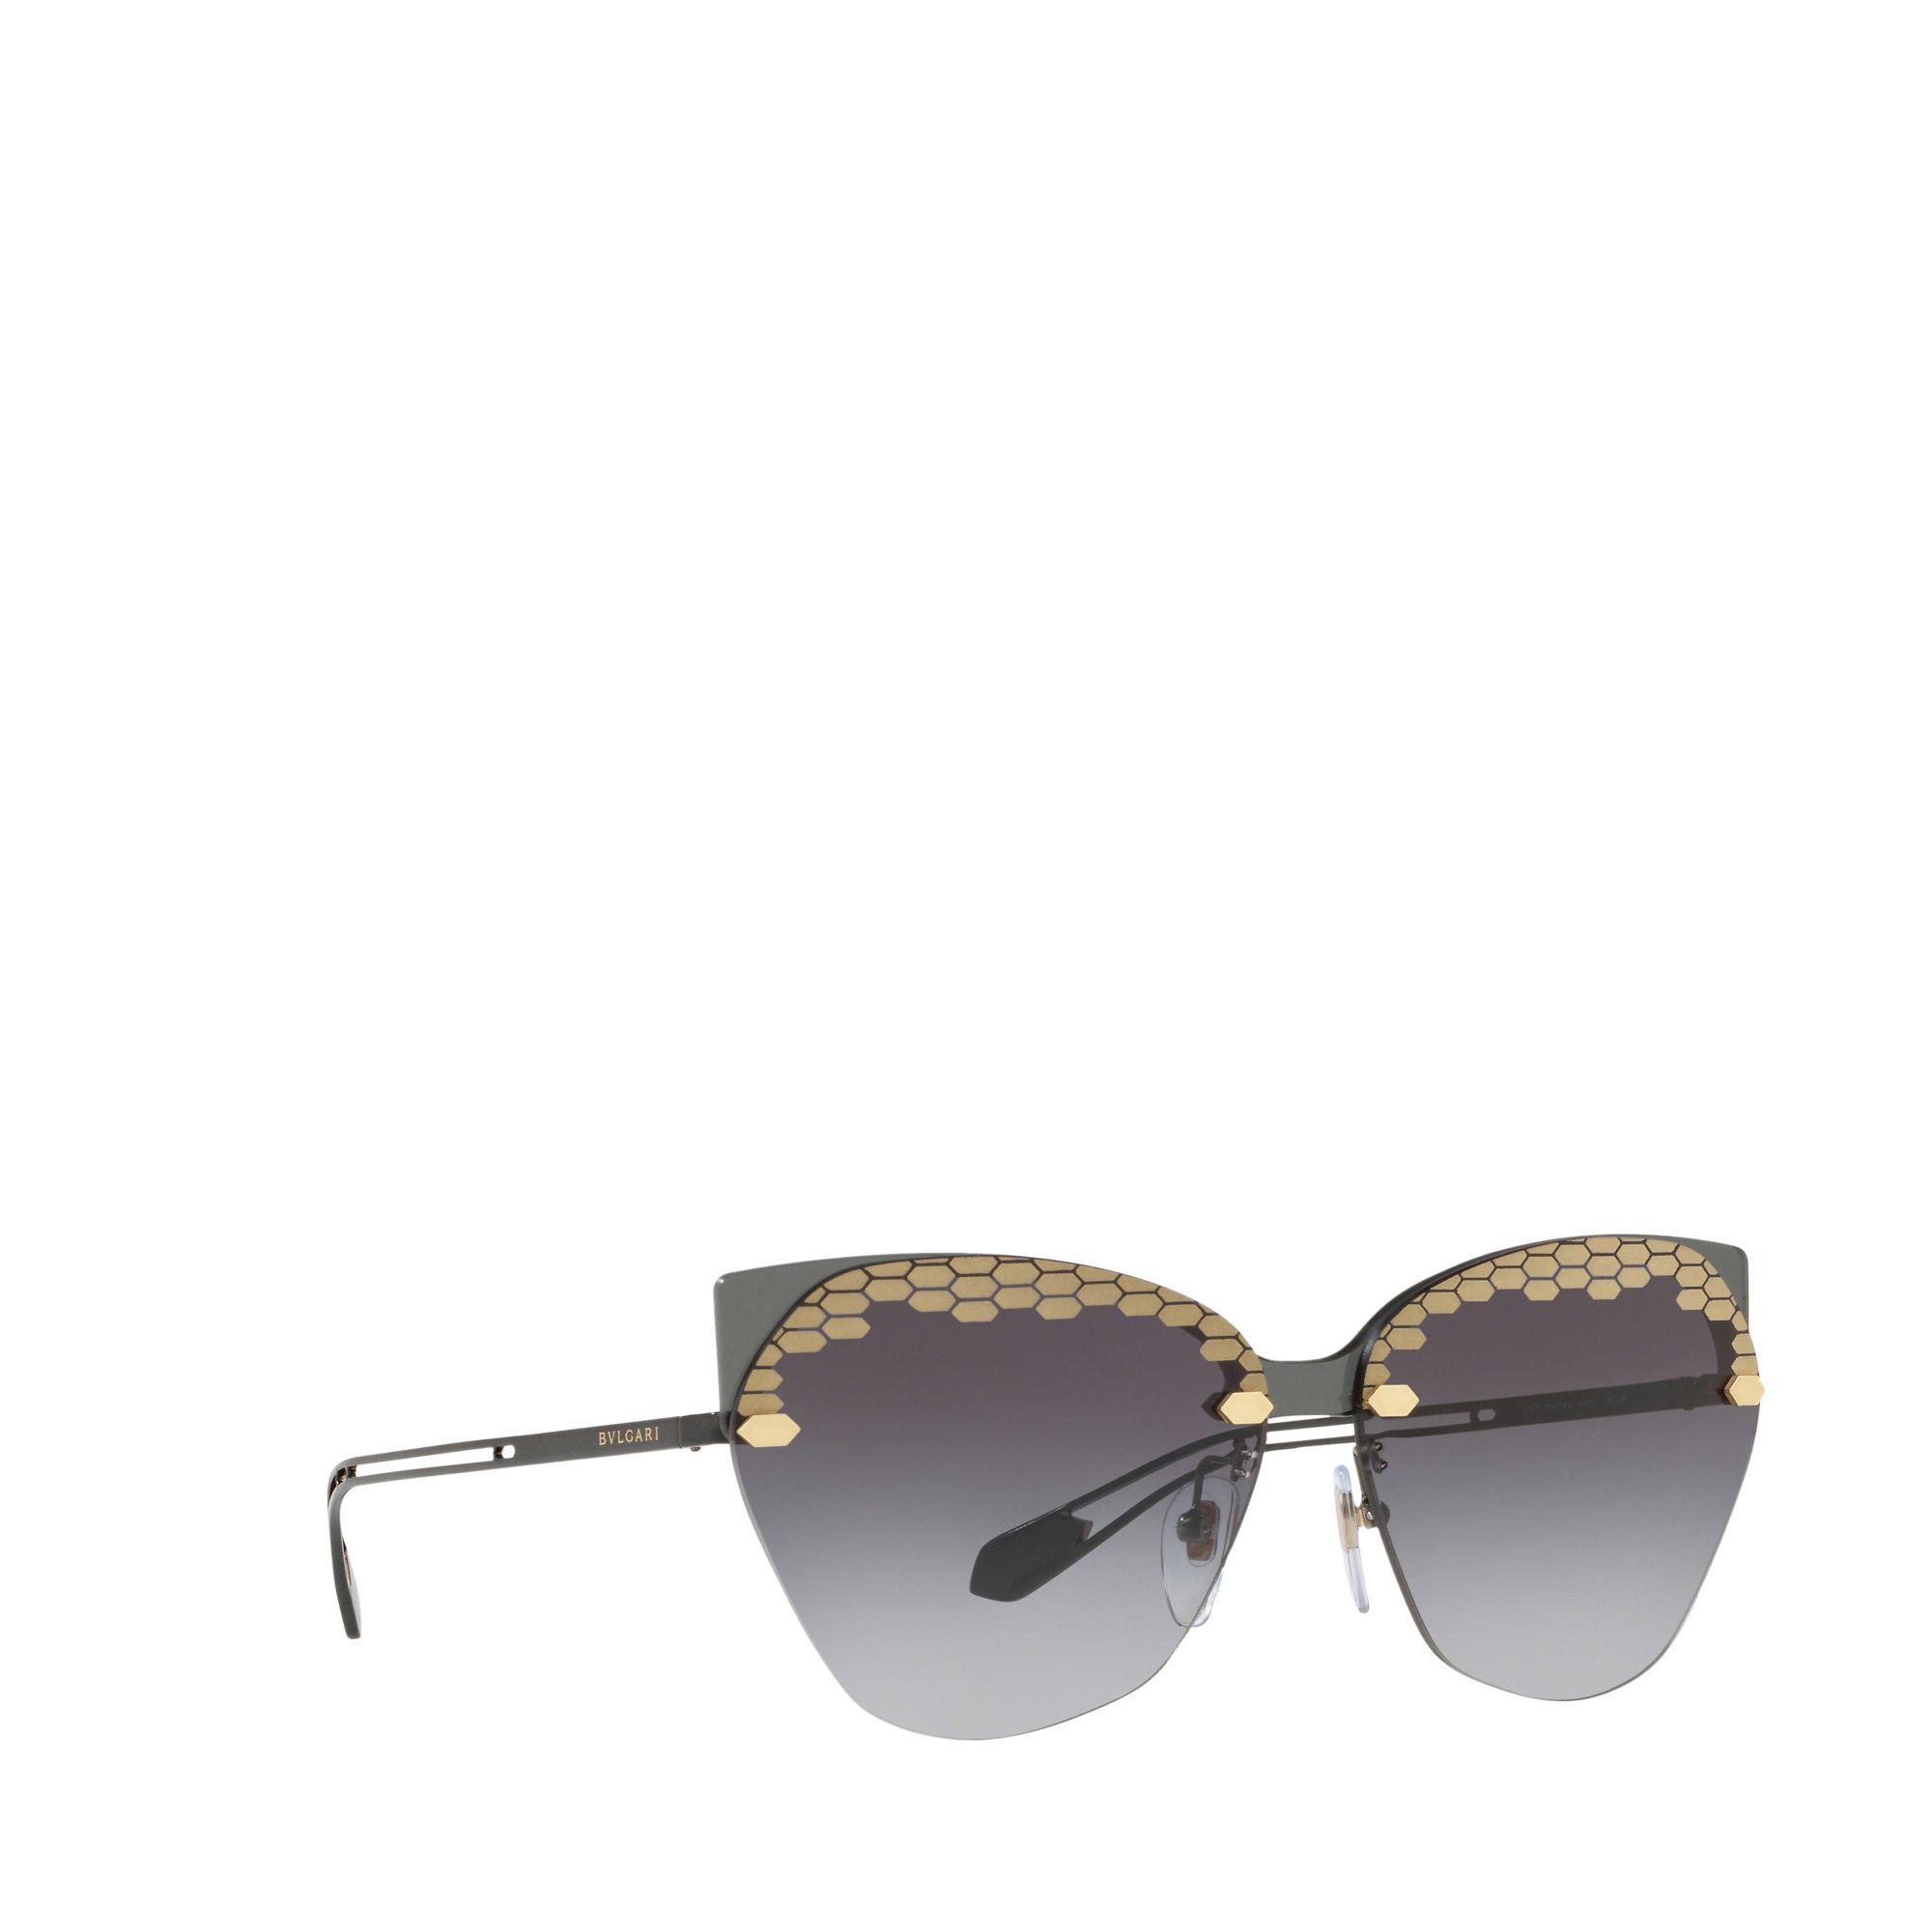 e61b5ceab3475 BVLGARI - Black 0bv6107 Irregular Sunglasses - Lyst. View fullscreen